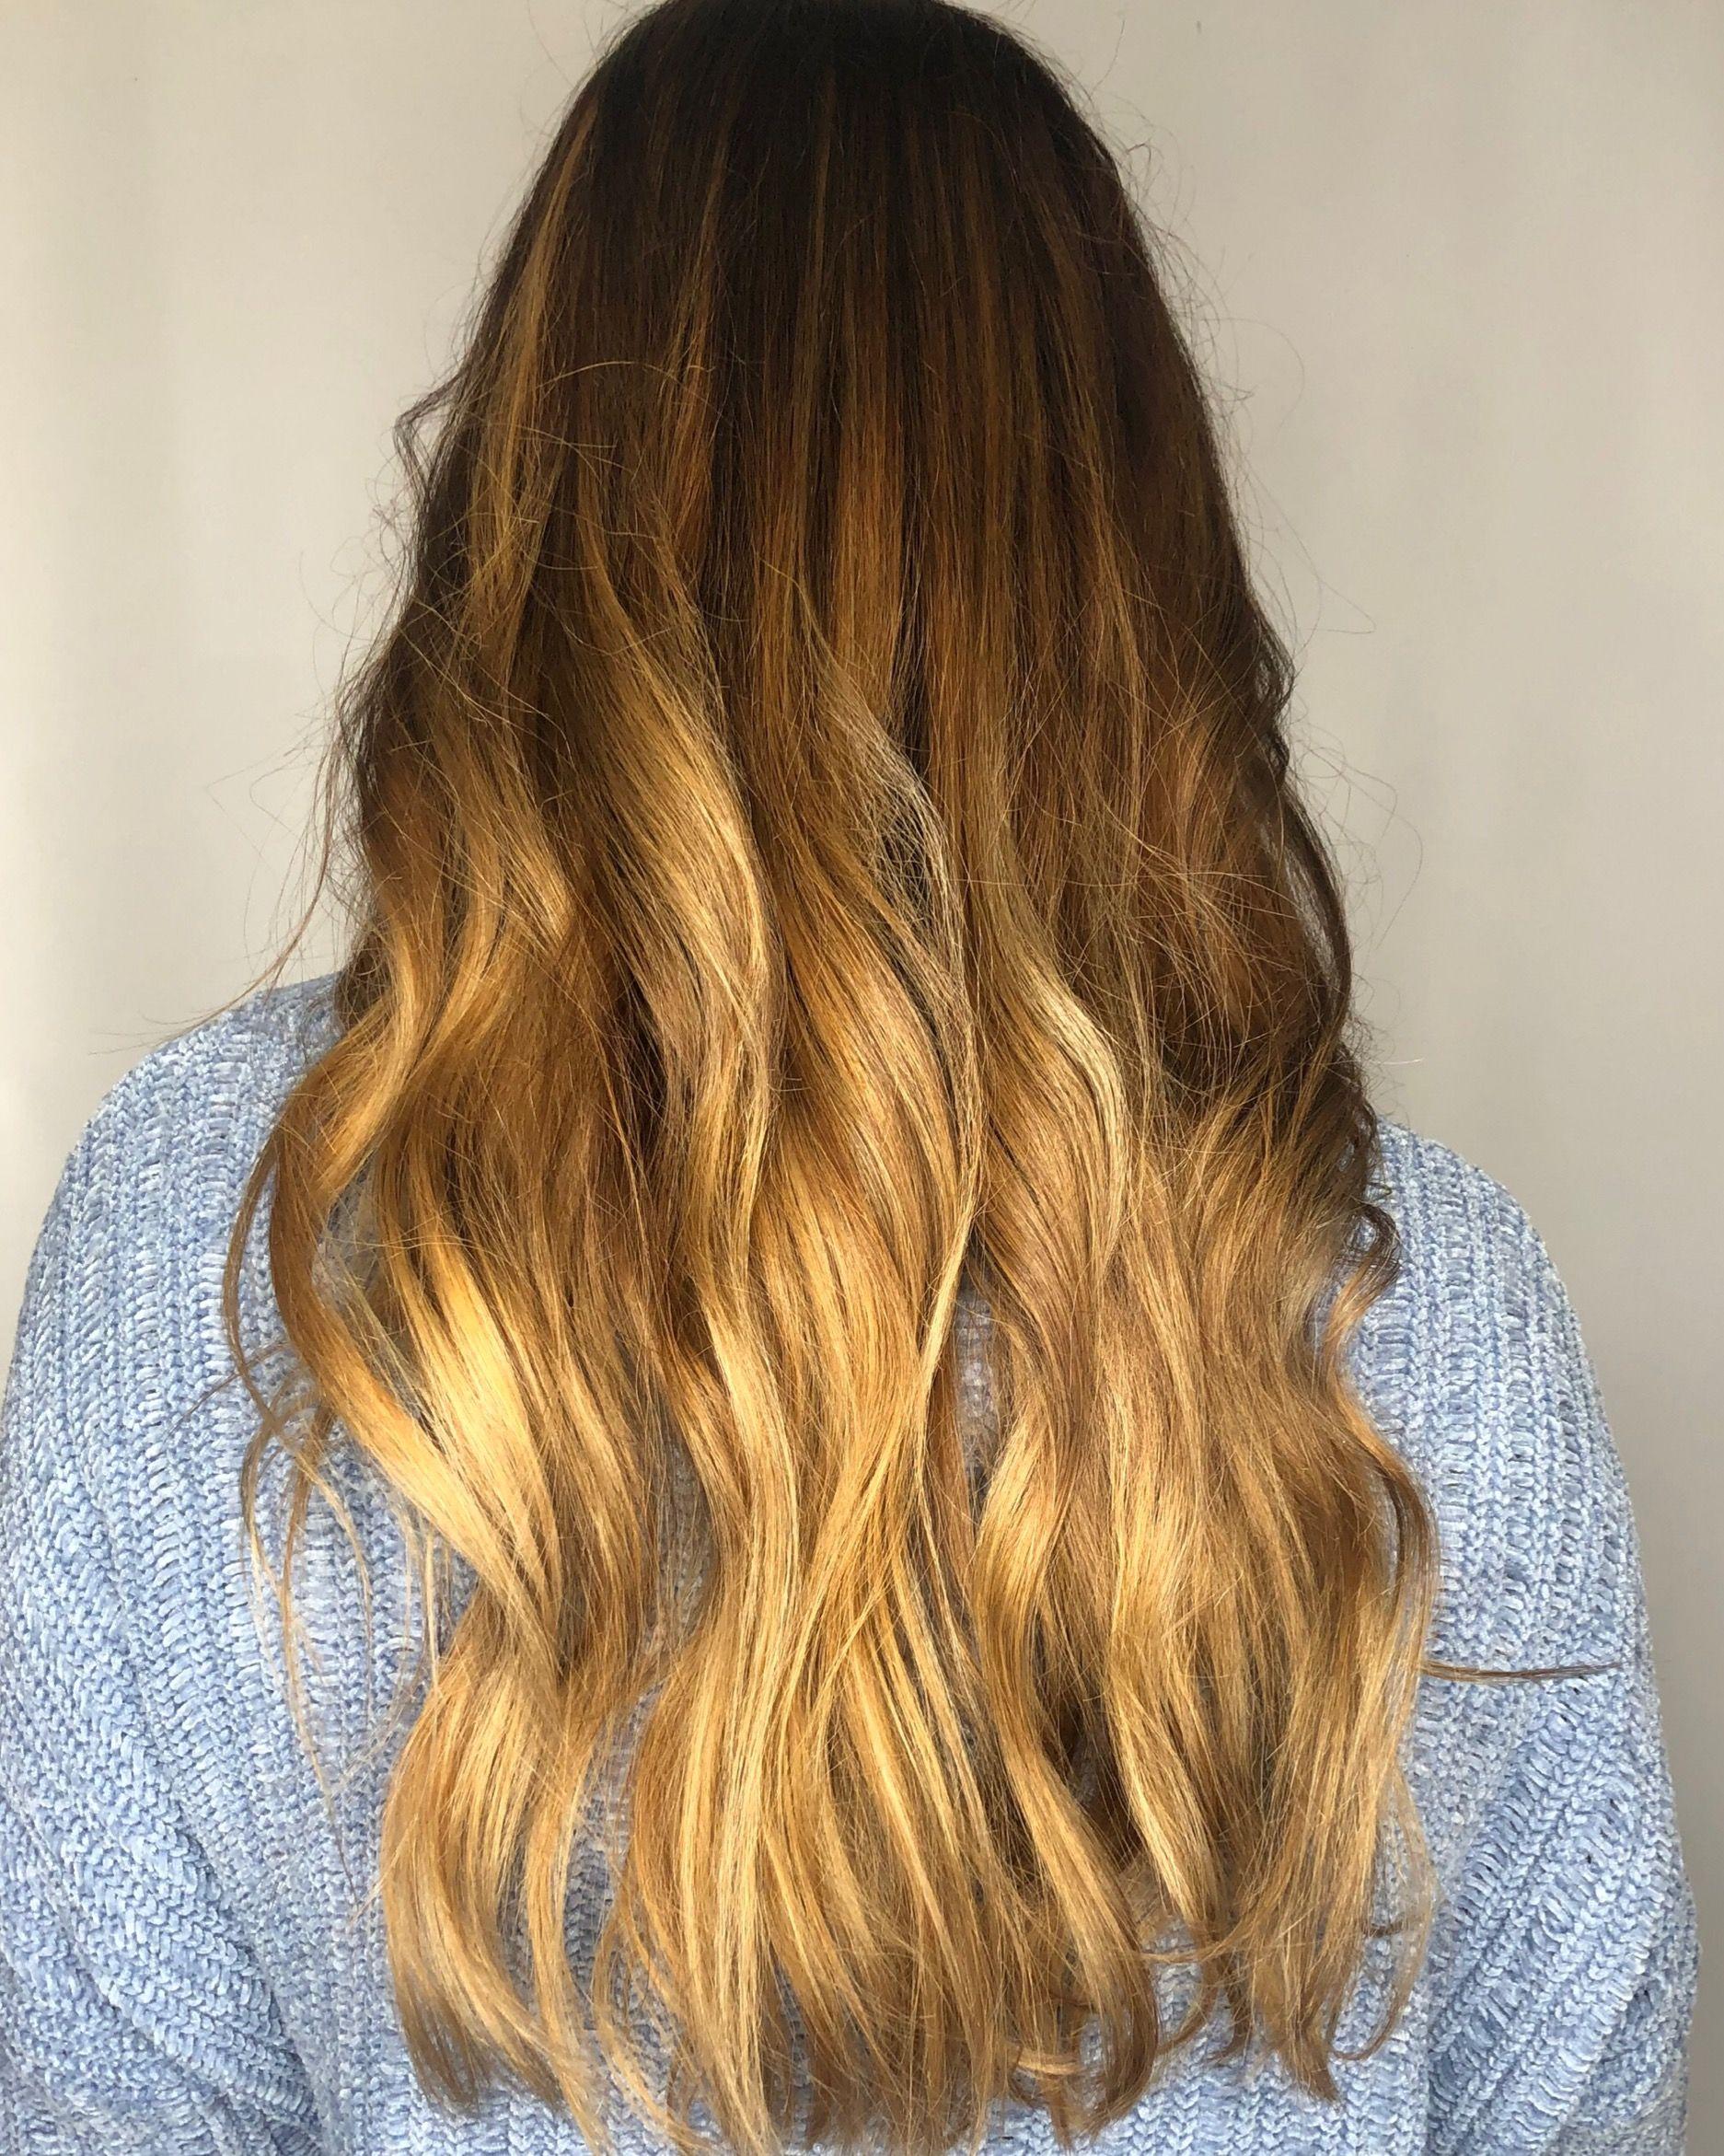 Pin By Ashley Lewis On Change Ya Hair Change Yo Life Hair Styles Beauty Hair